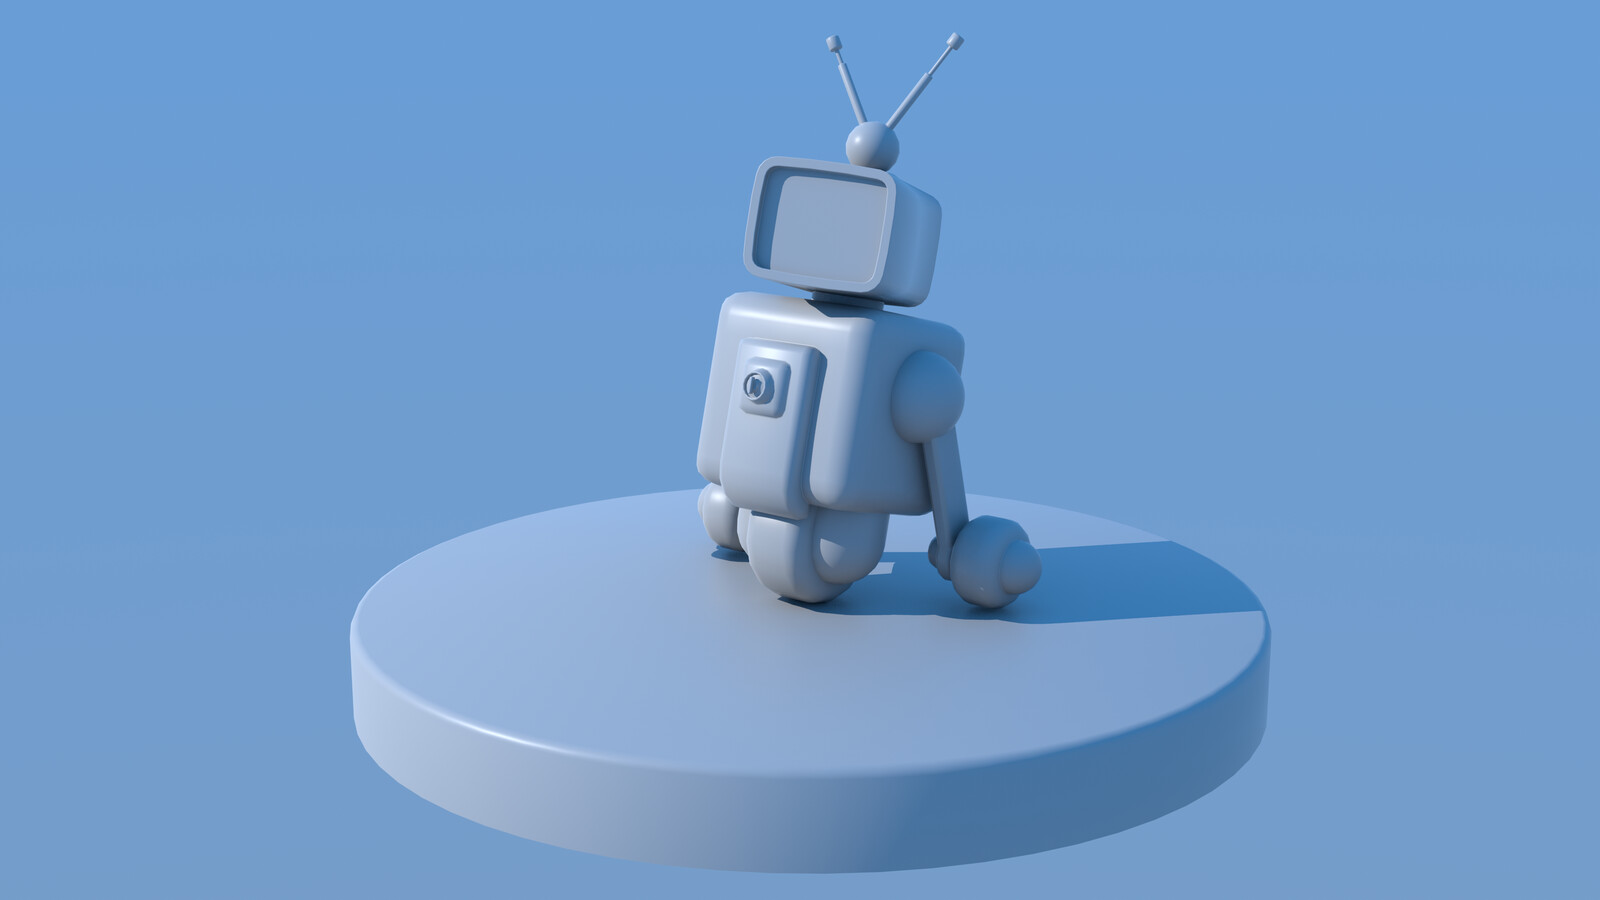 Low-Stimulation Robot